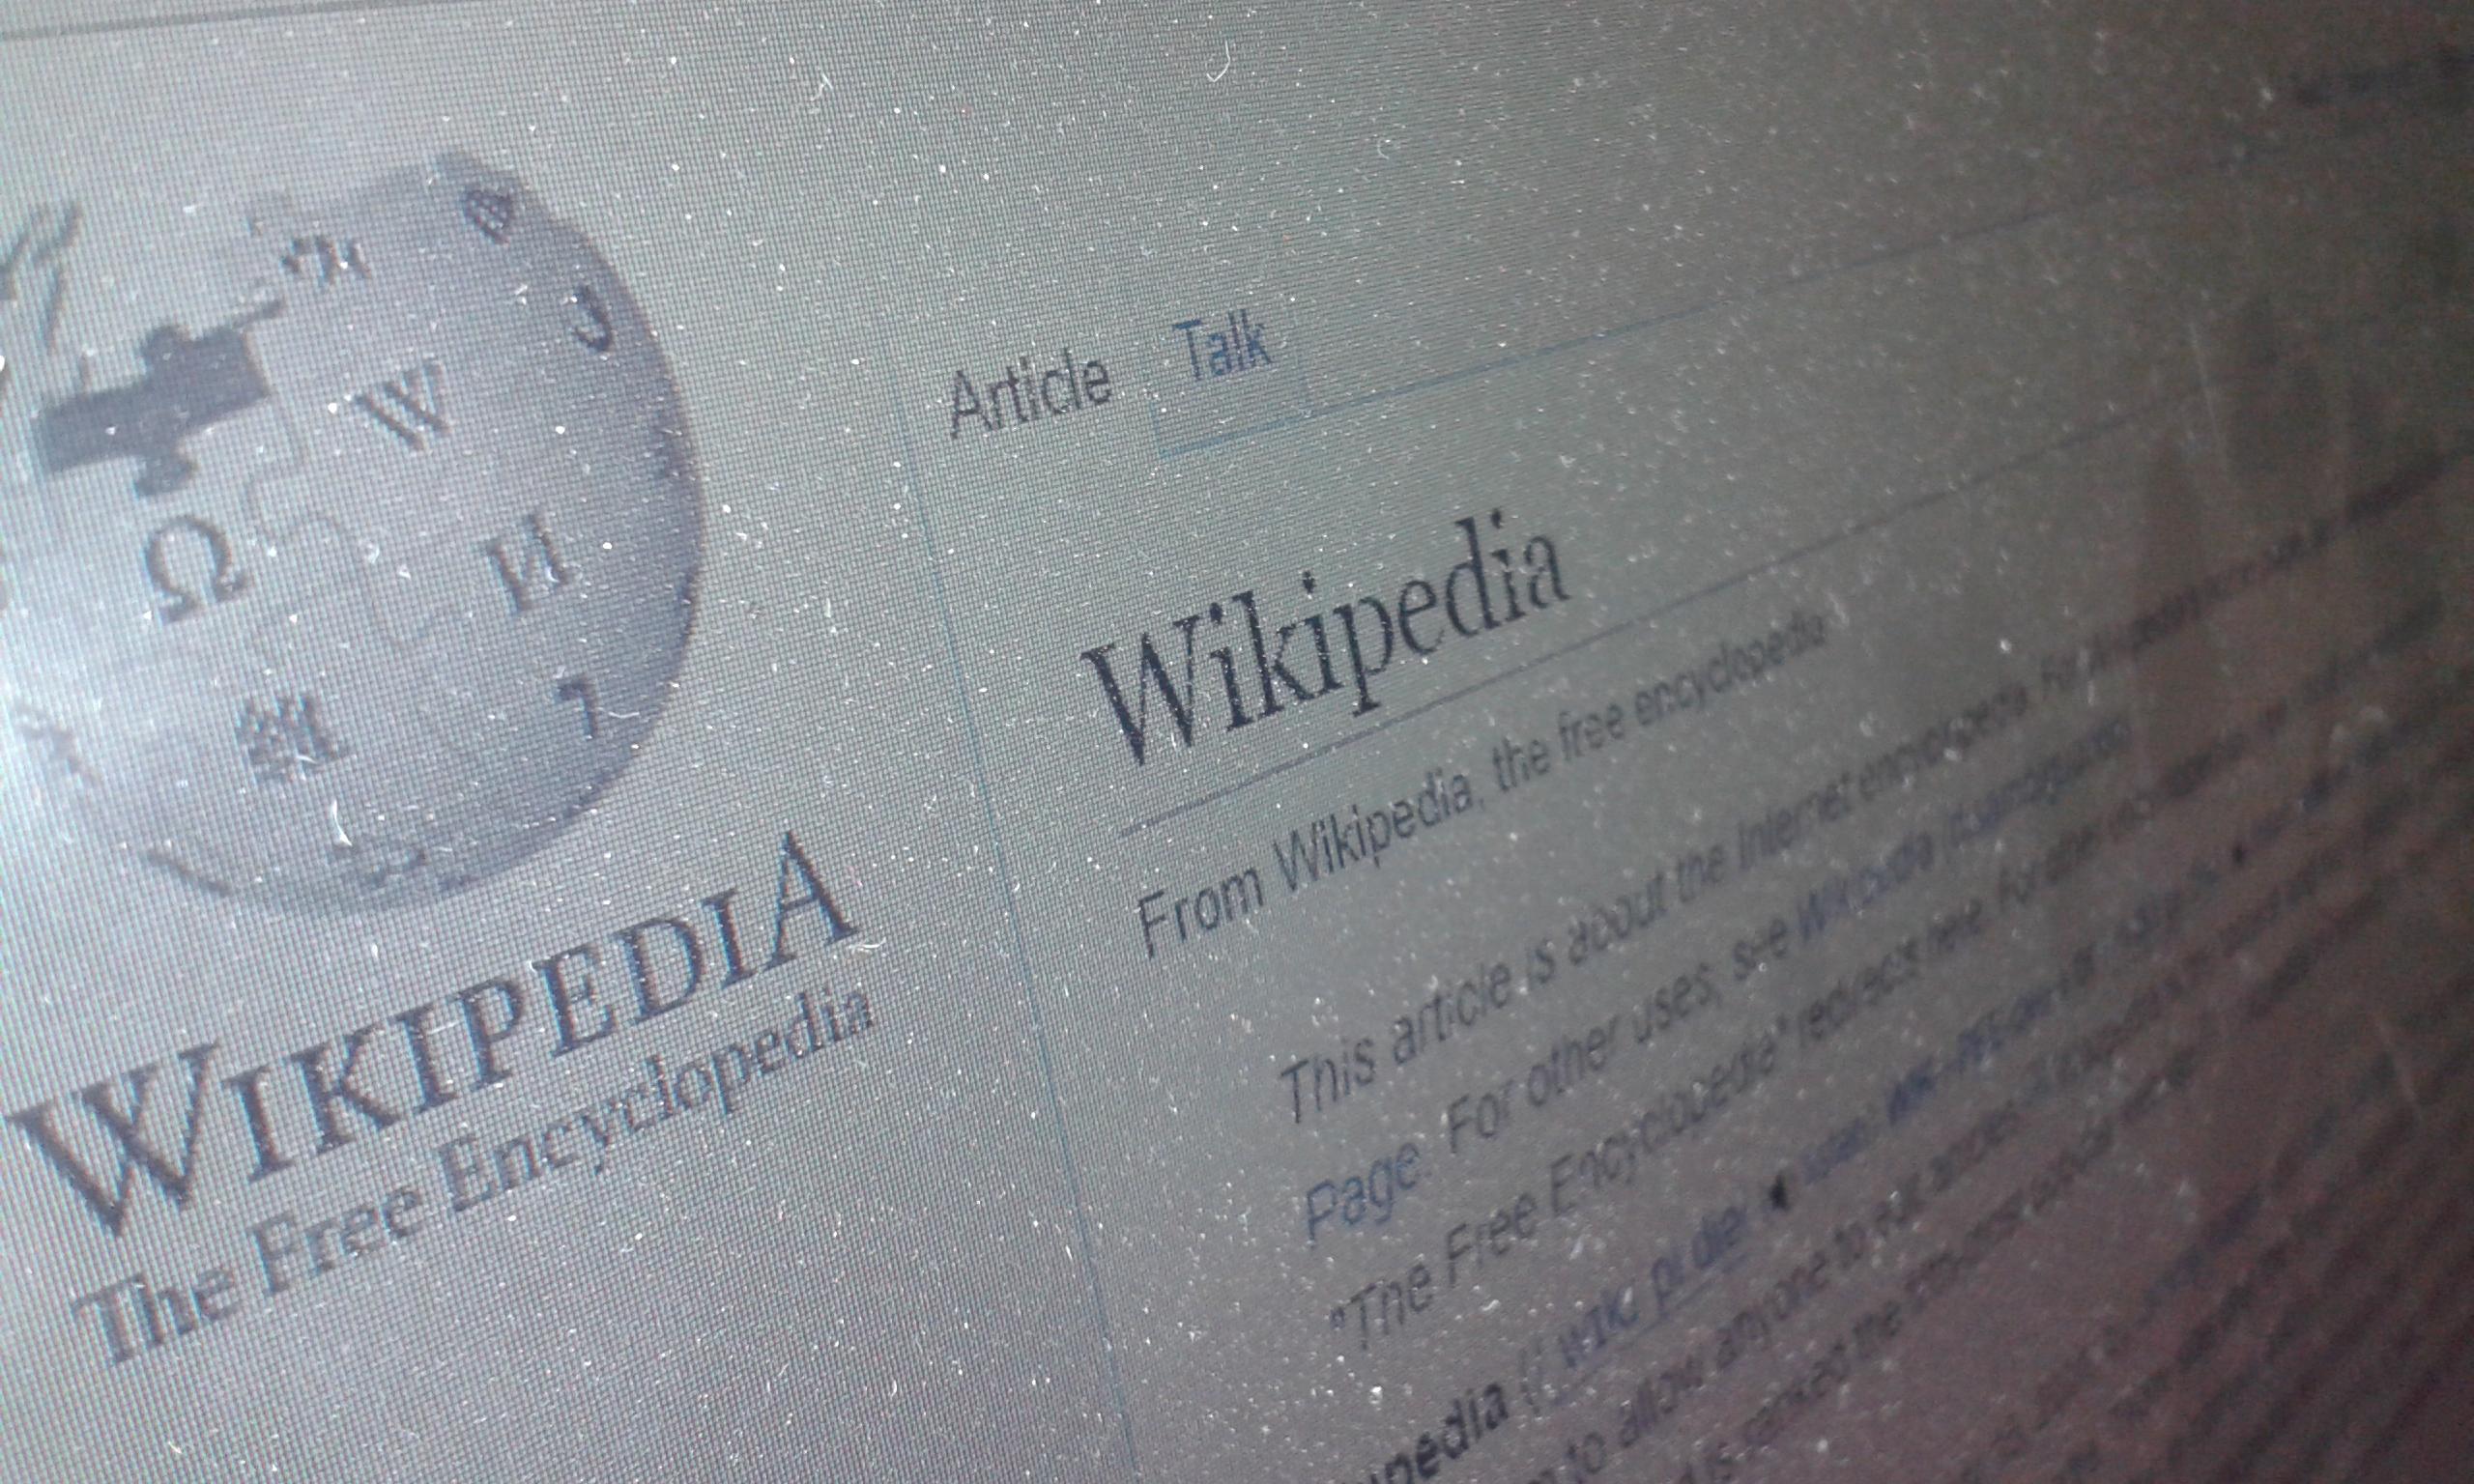 6b4e9ad1dc6b6 منظمة غير ربحية - ويكيبيديا، الموسوعة الحرة